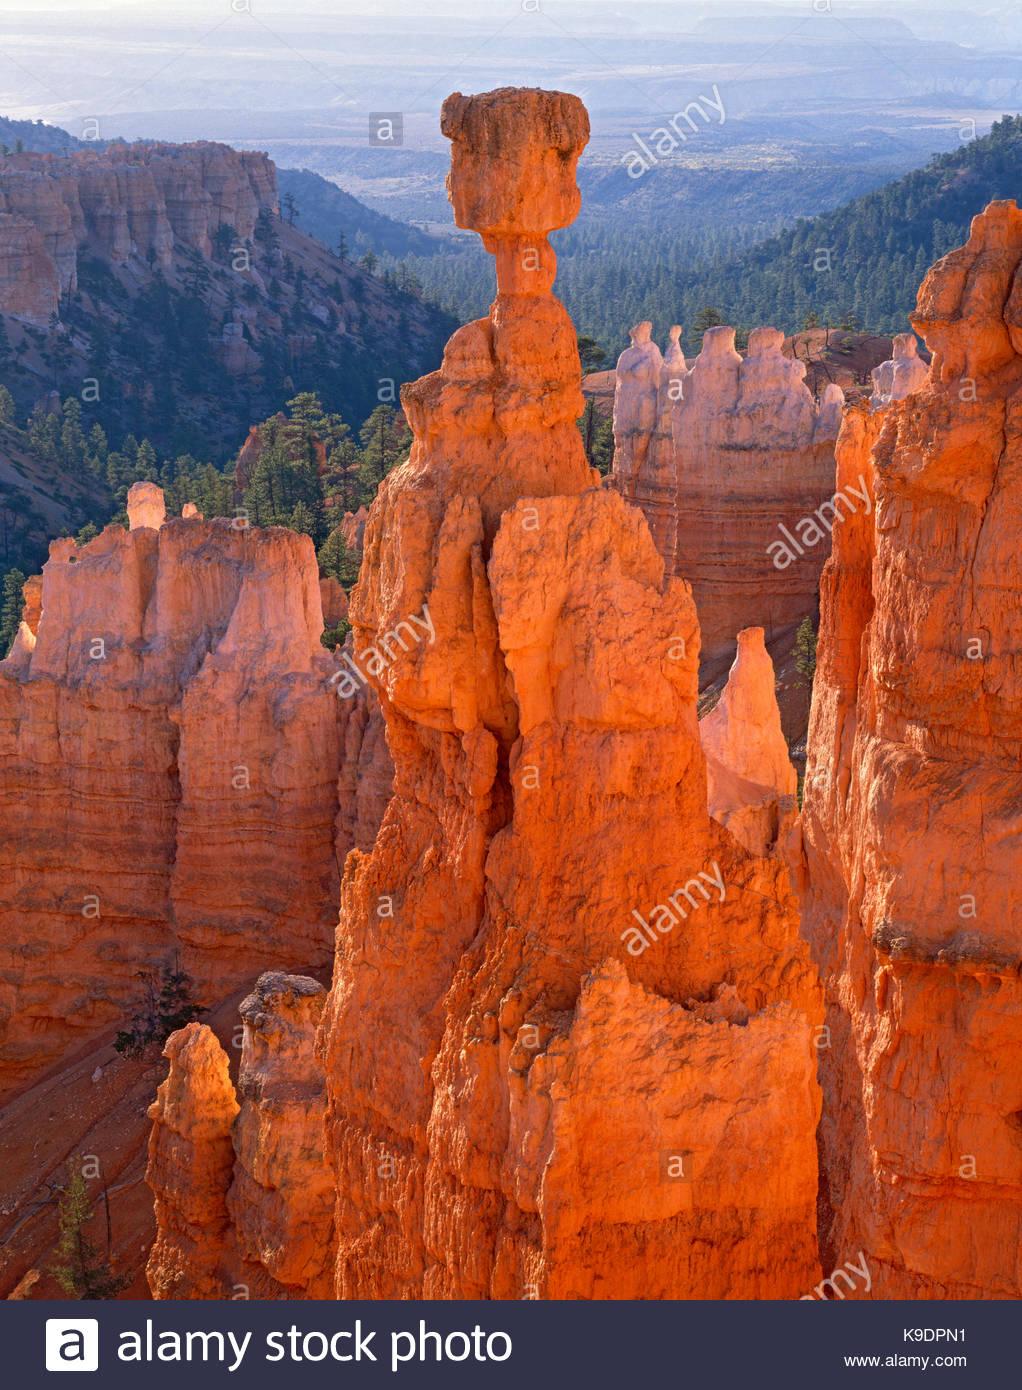 Thor's Hammer, Bryce Canyon, National Park, Utah - Stock Image